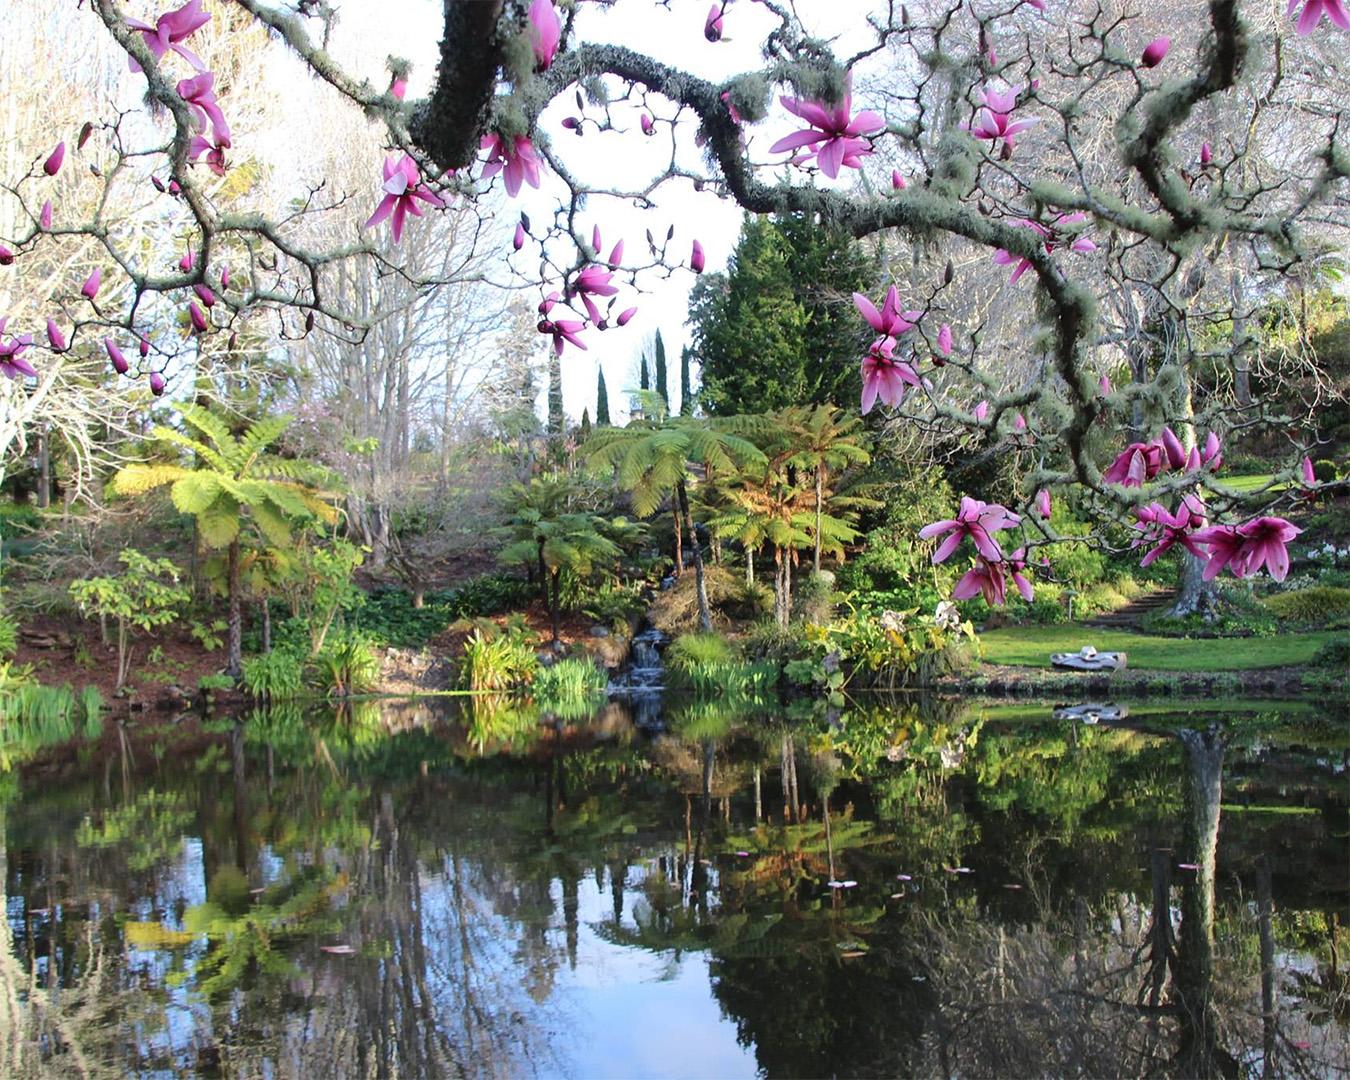 Beautiful flowers overlook a lake at Ayrlies Garden.